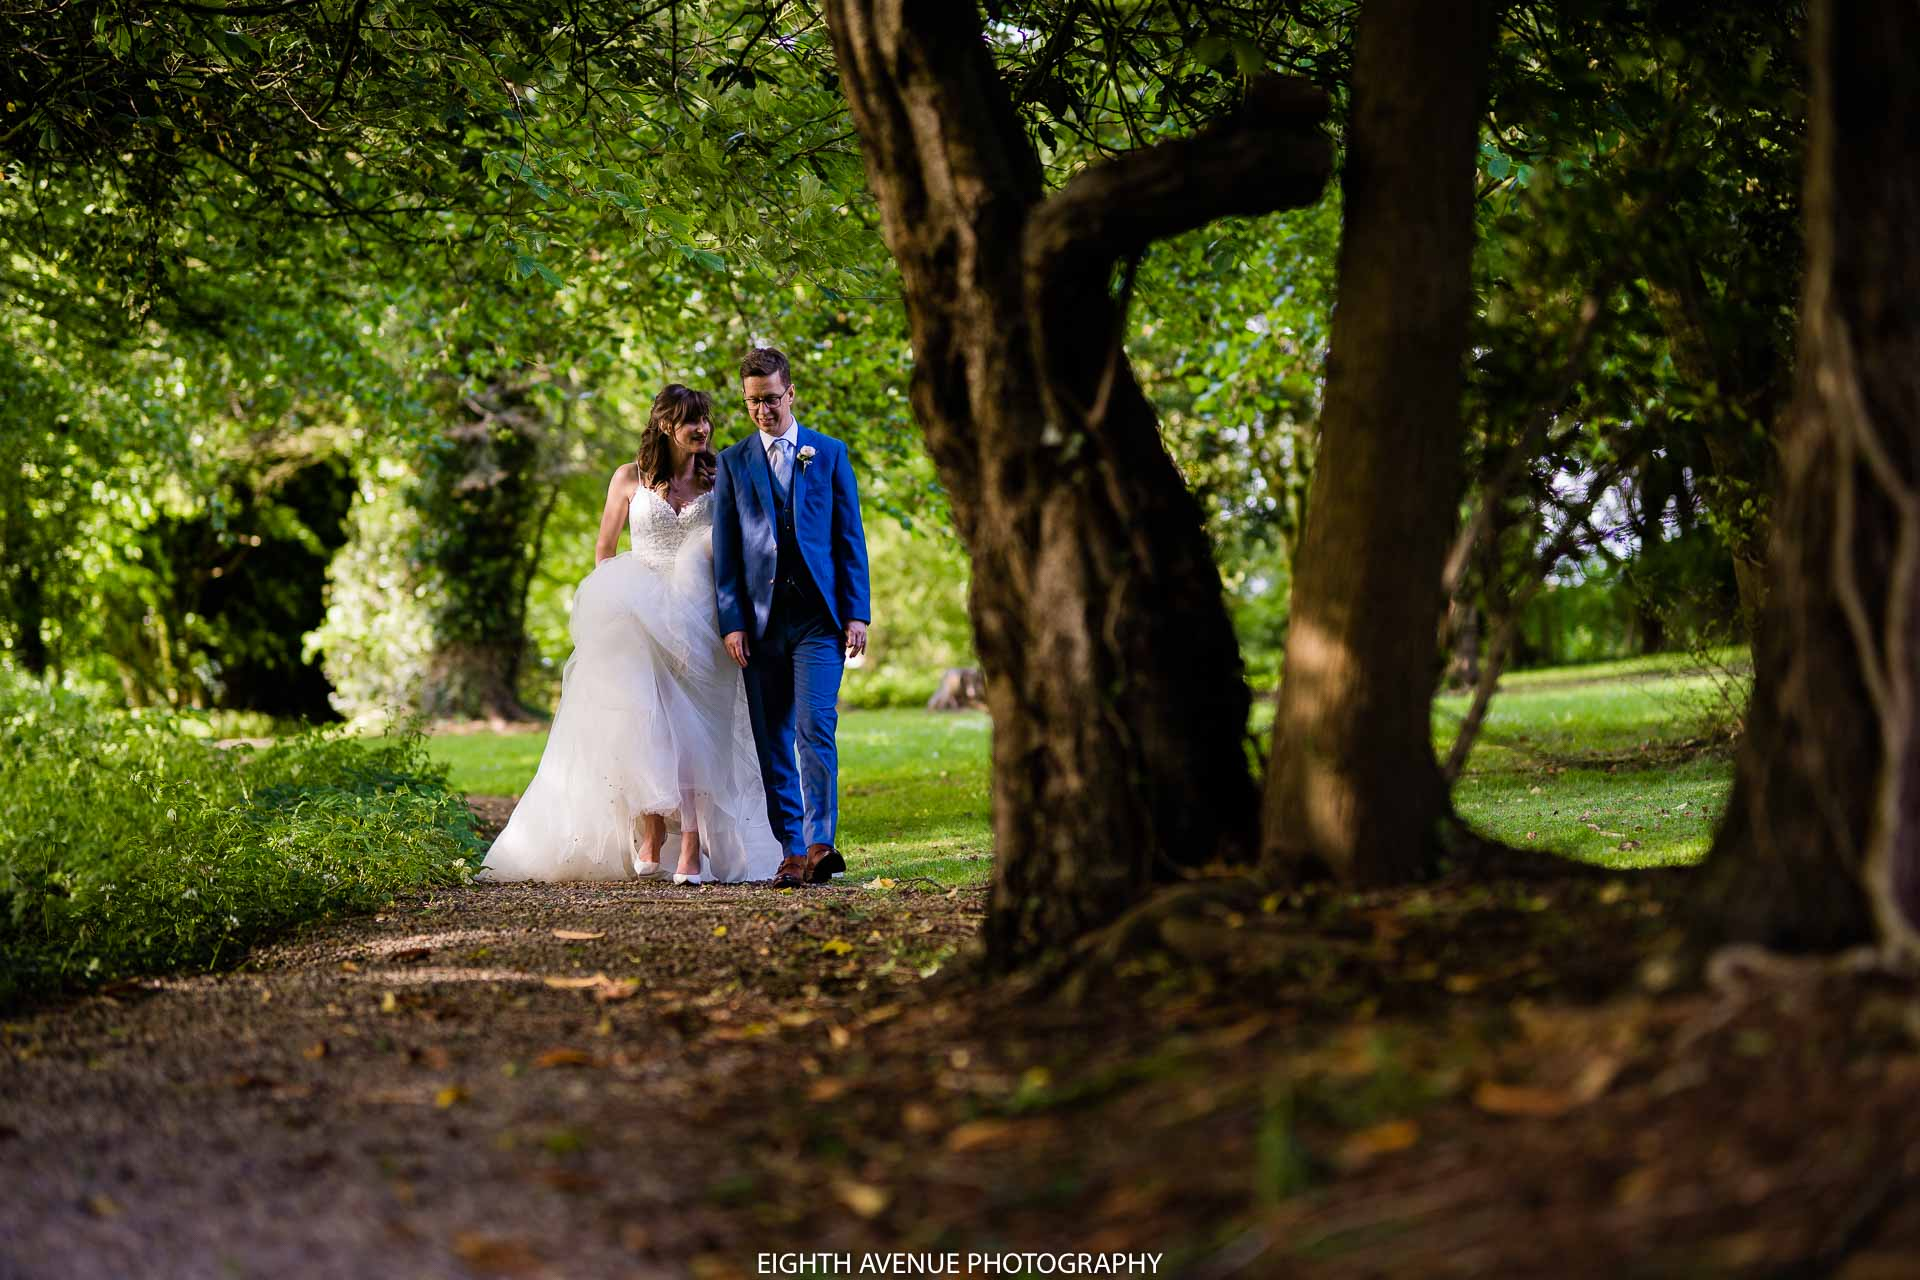 bride and groom waling along path